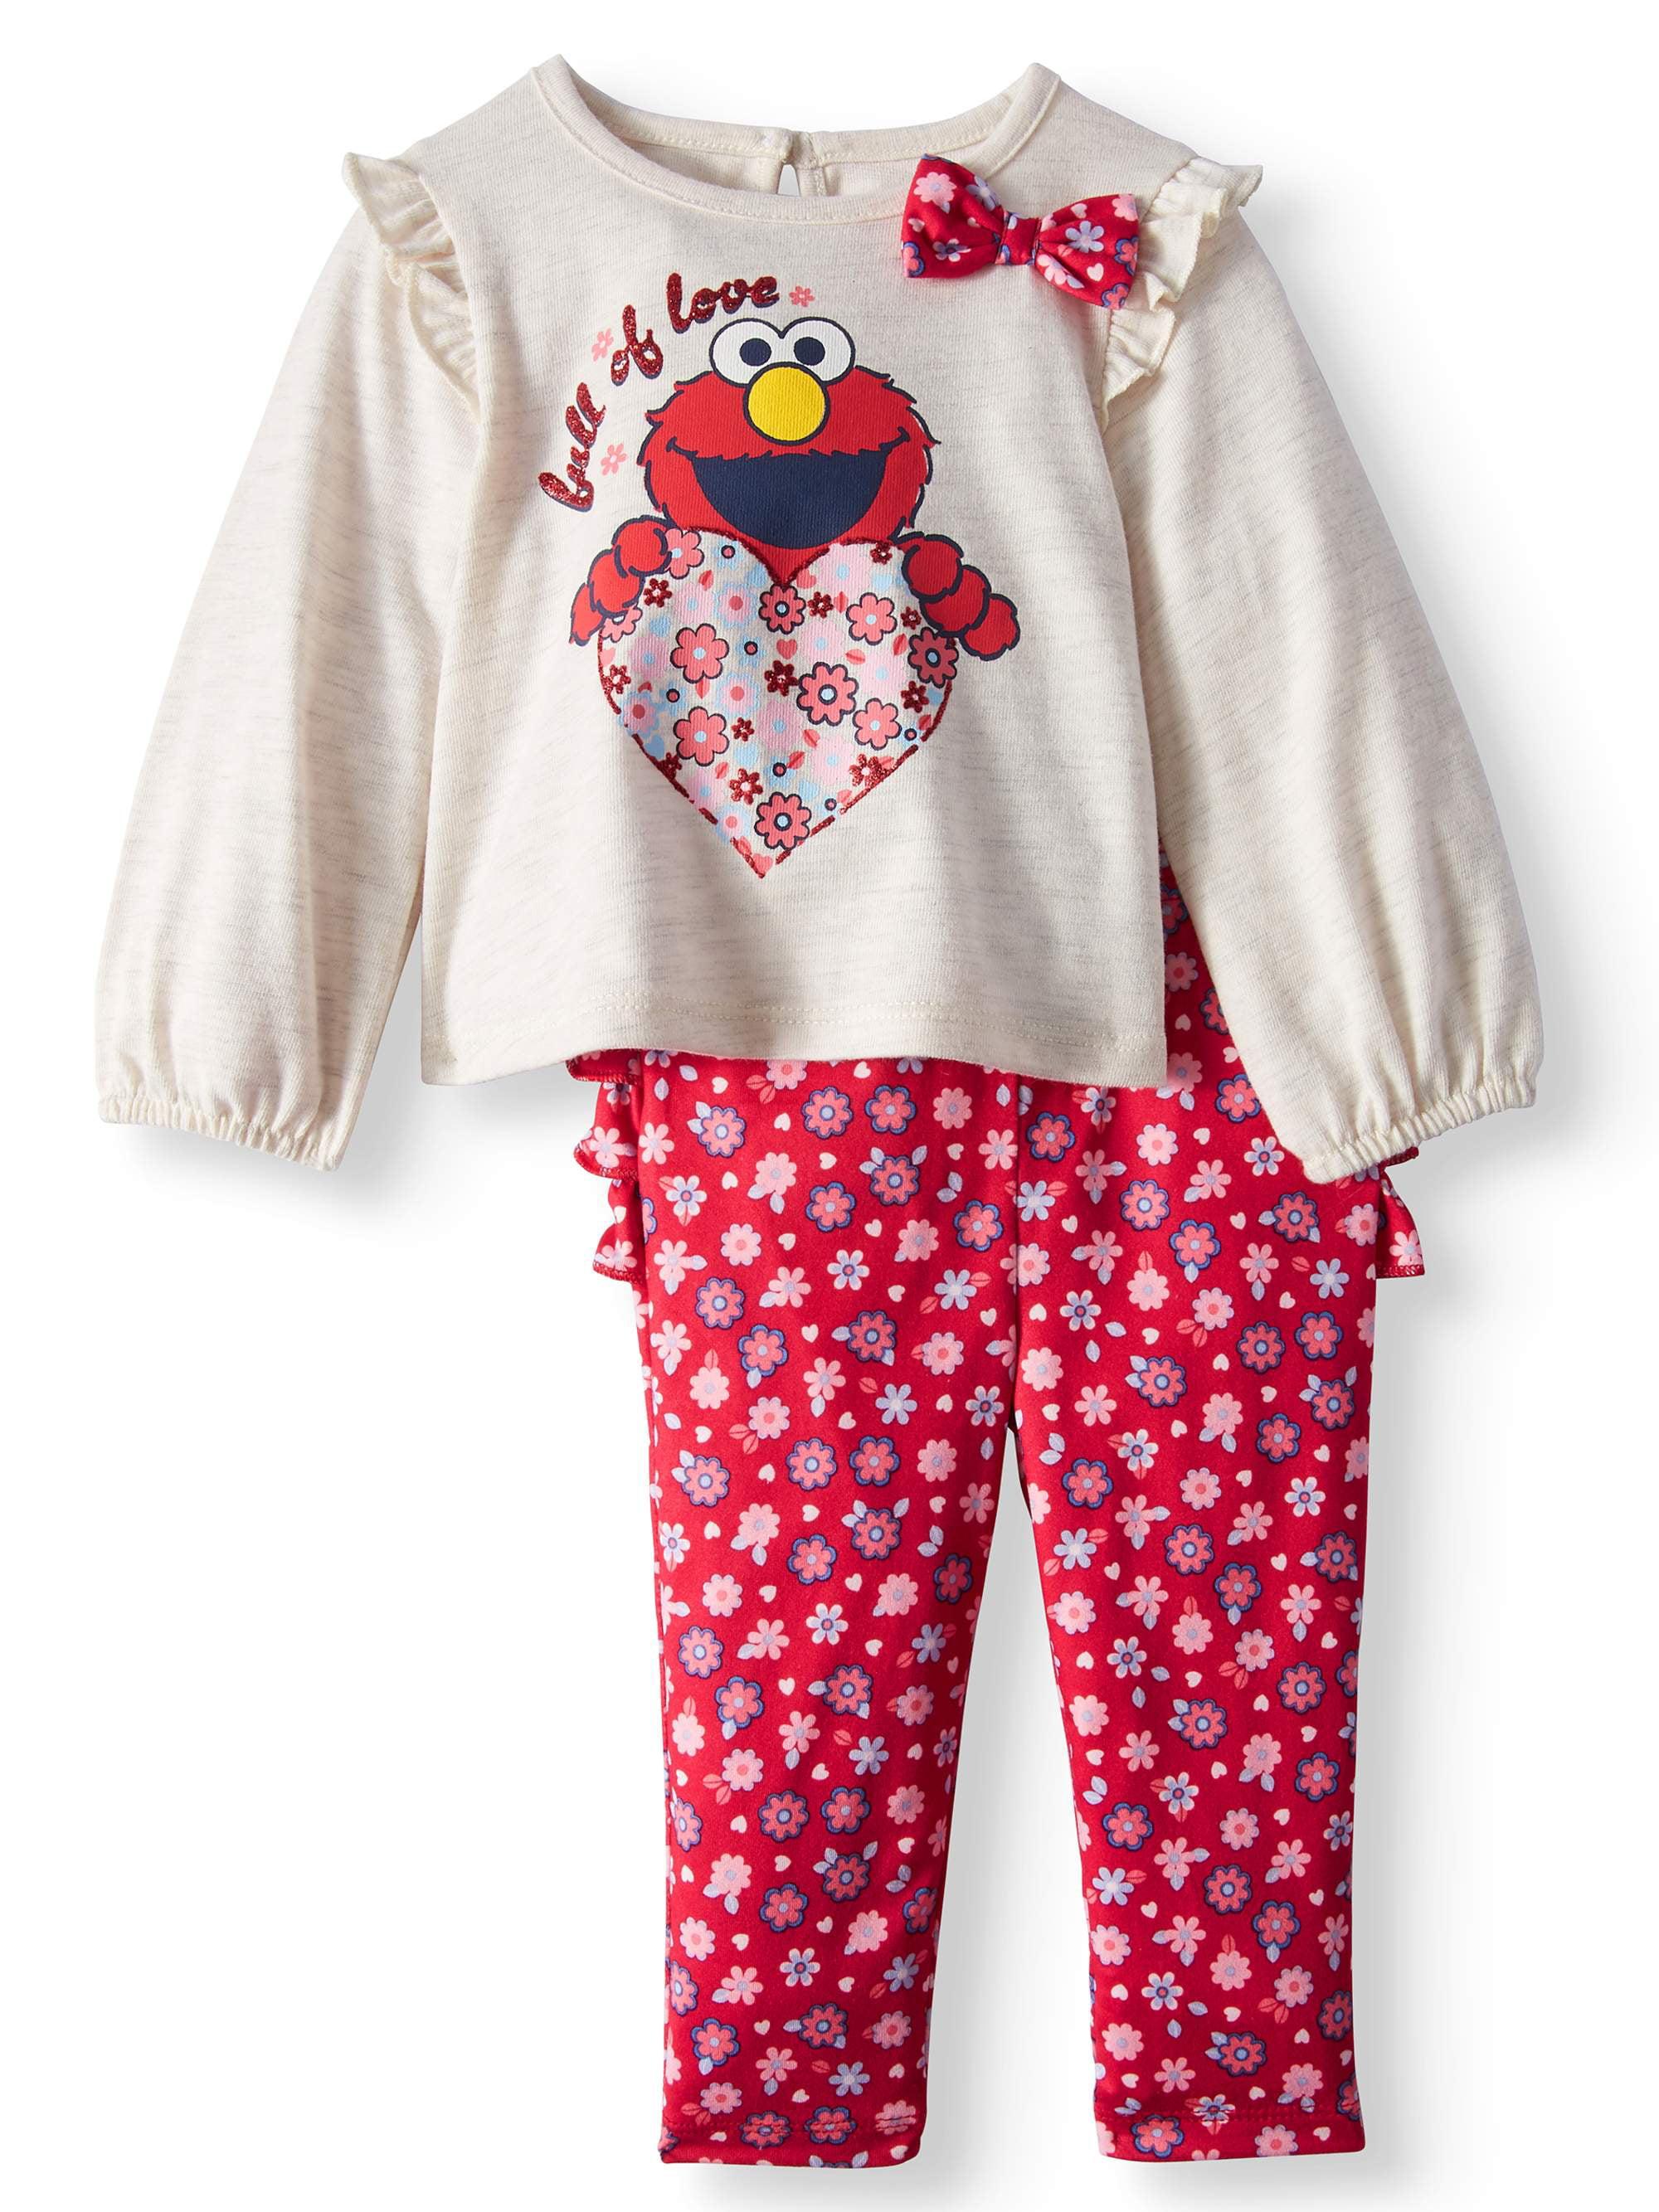 Ruffle Sleeve Long Sleeve Top & Rumba Ruffle Leggings, 2-Piece Outfit Set (Baby Girls)